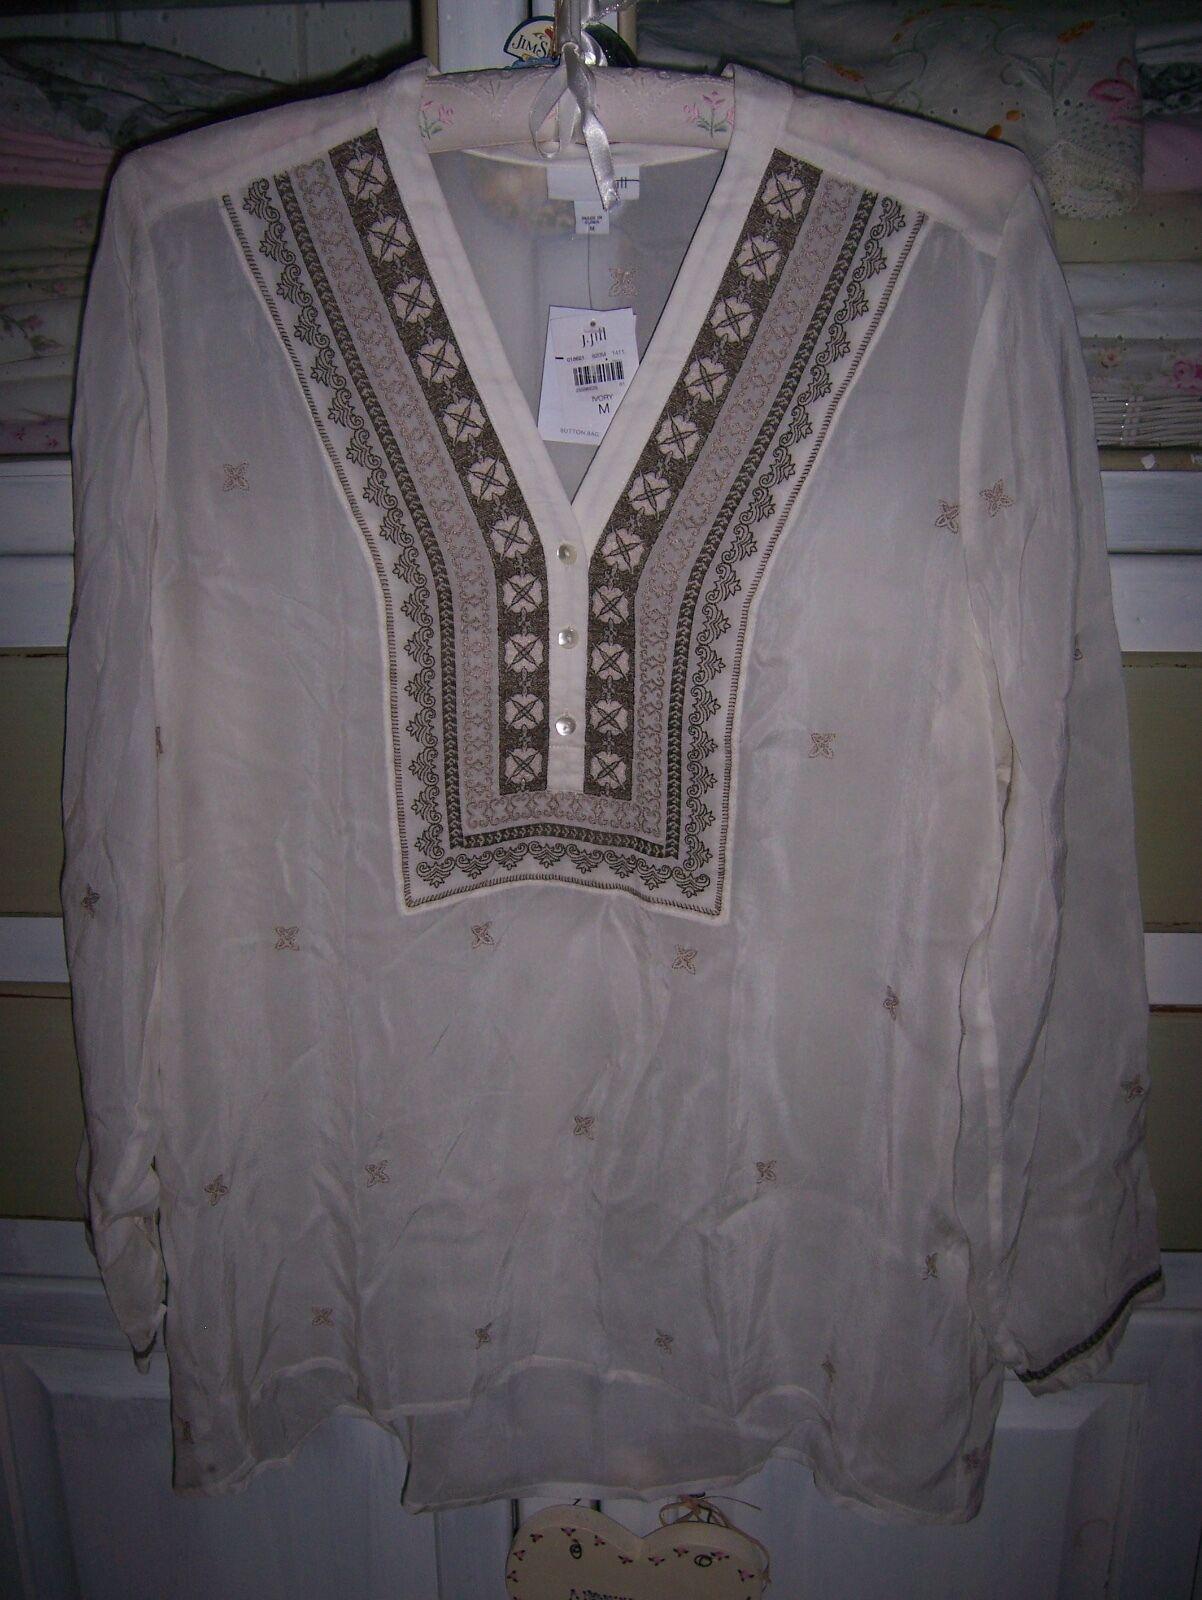 NWT J.Jill Ivory Royal Medallion Romantic Gossamer Tunic Top Blouse XL